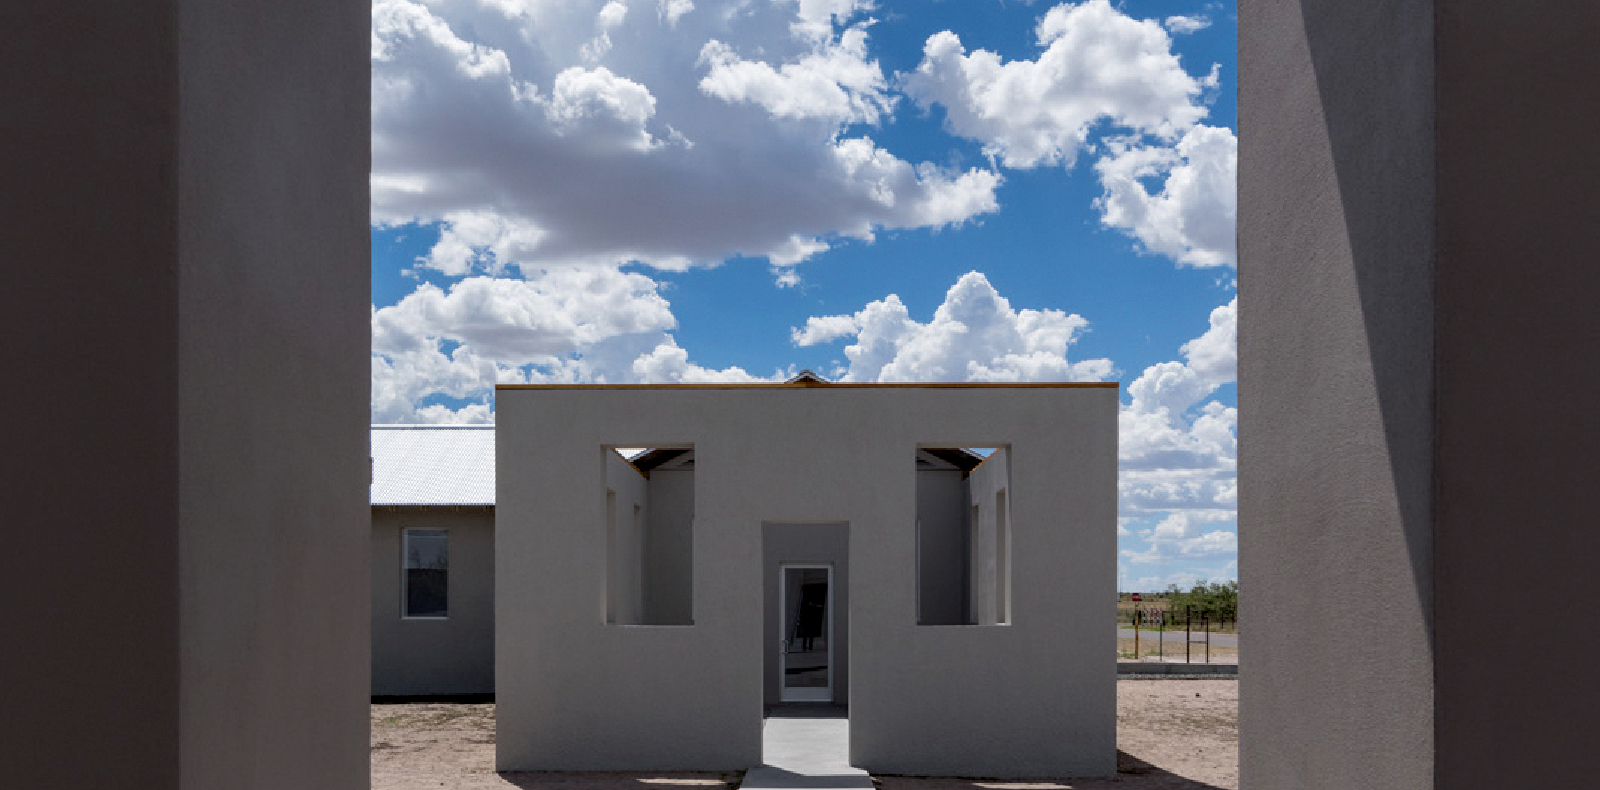 Installation de Robert Irwin, Untitled (Dawn to Dusk), 2016. Collection permanente, The Chinati Foundation. Photo par Philipp Scholz Rittermann, courtesy of The Chinati Foundation © 2017 Robert Irwin/ARS, New York